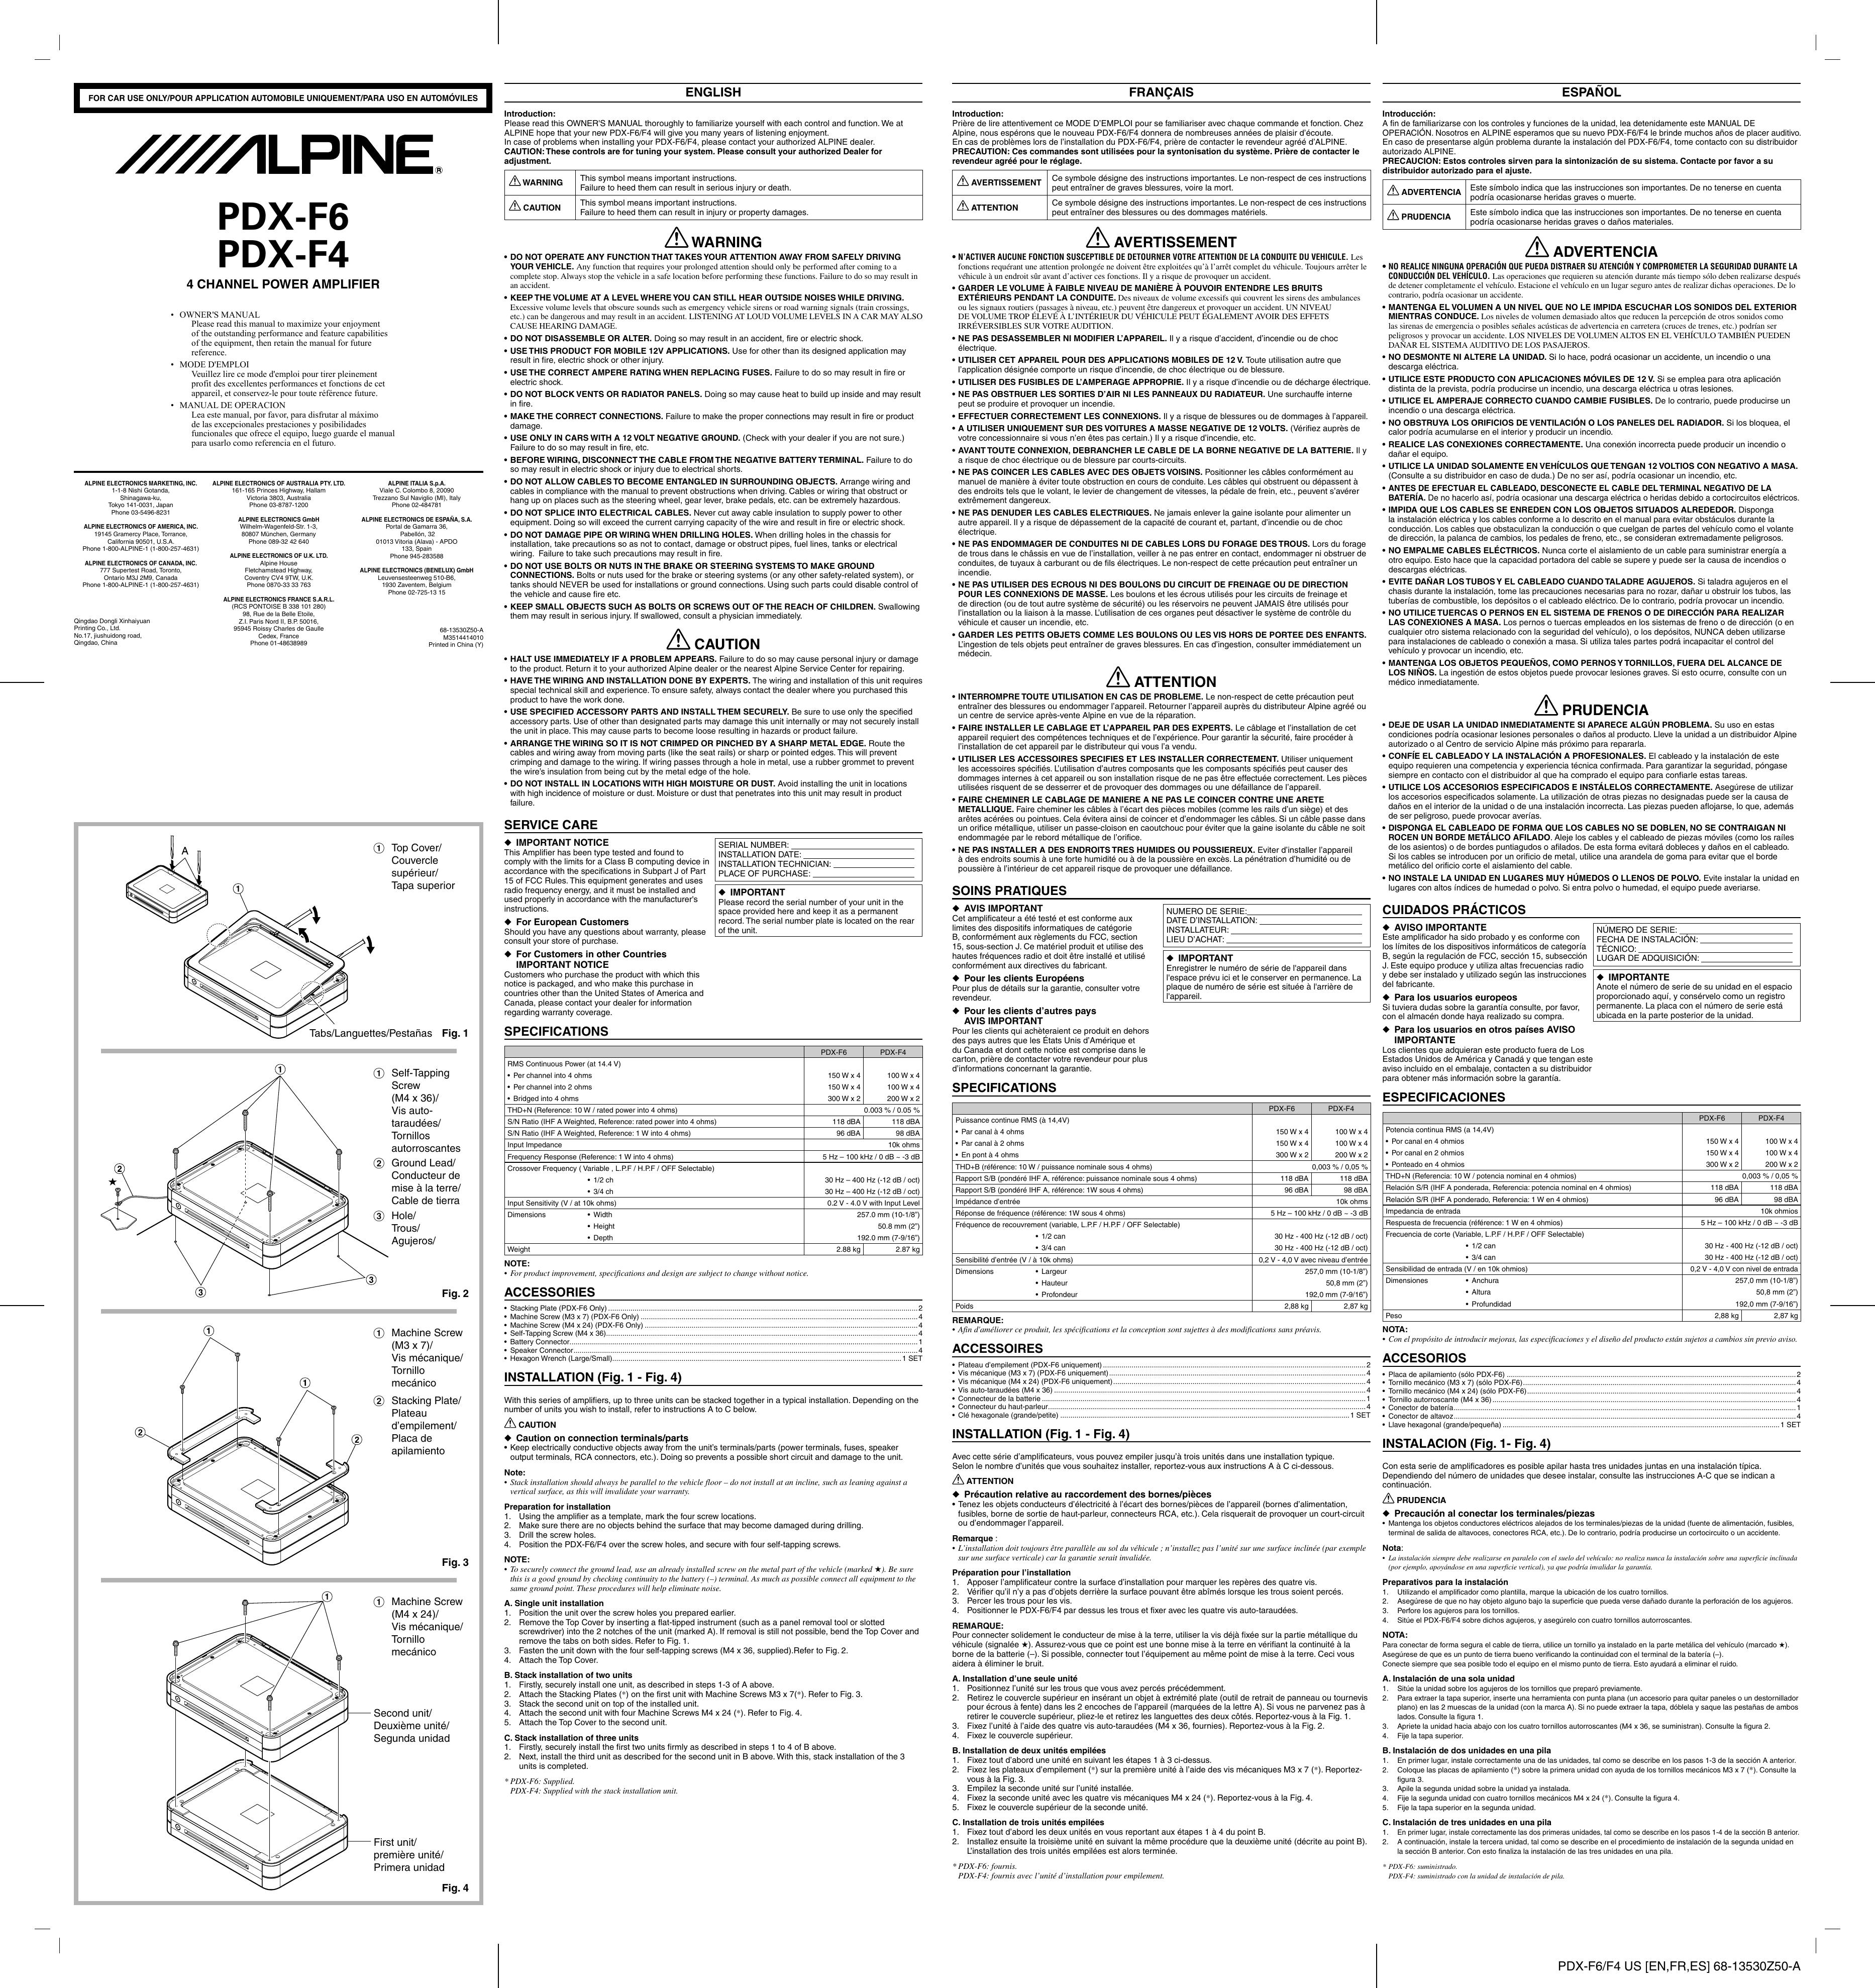 Danfoss fp15 user manual promotional products array 98 f4 manual rh 98 f4 manual angelayu us fandeluxe Choice Image